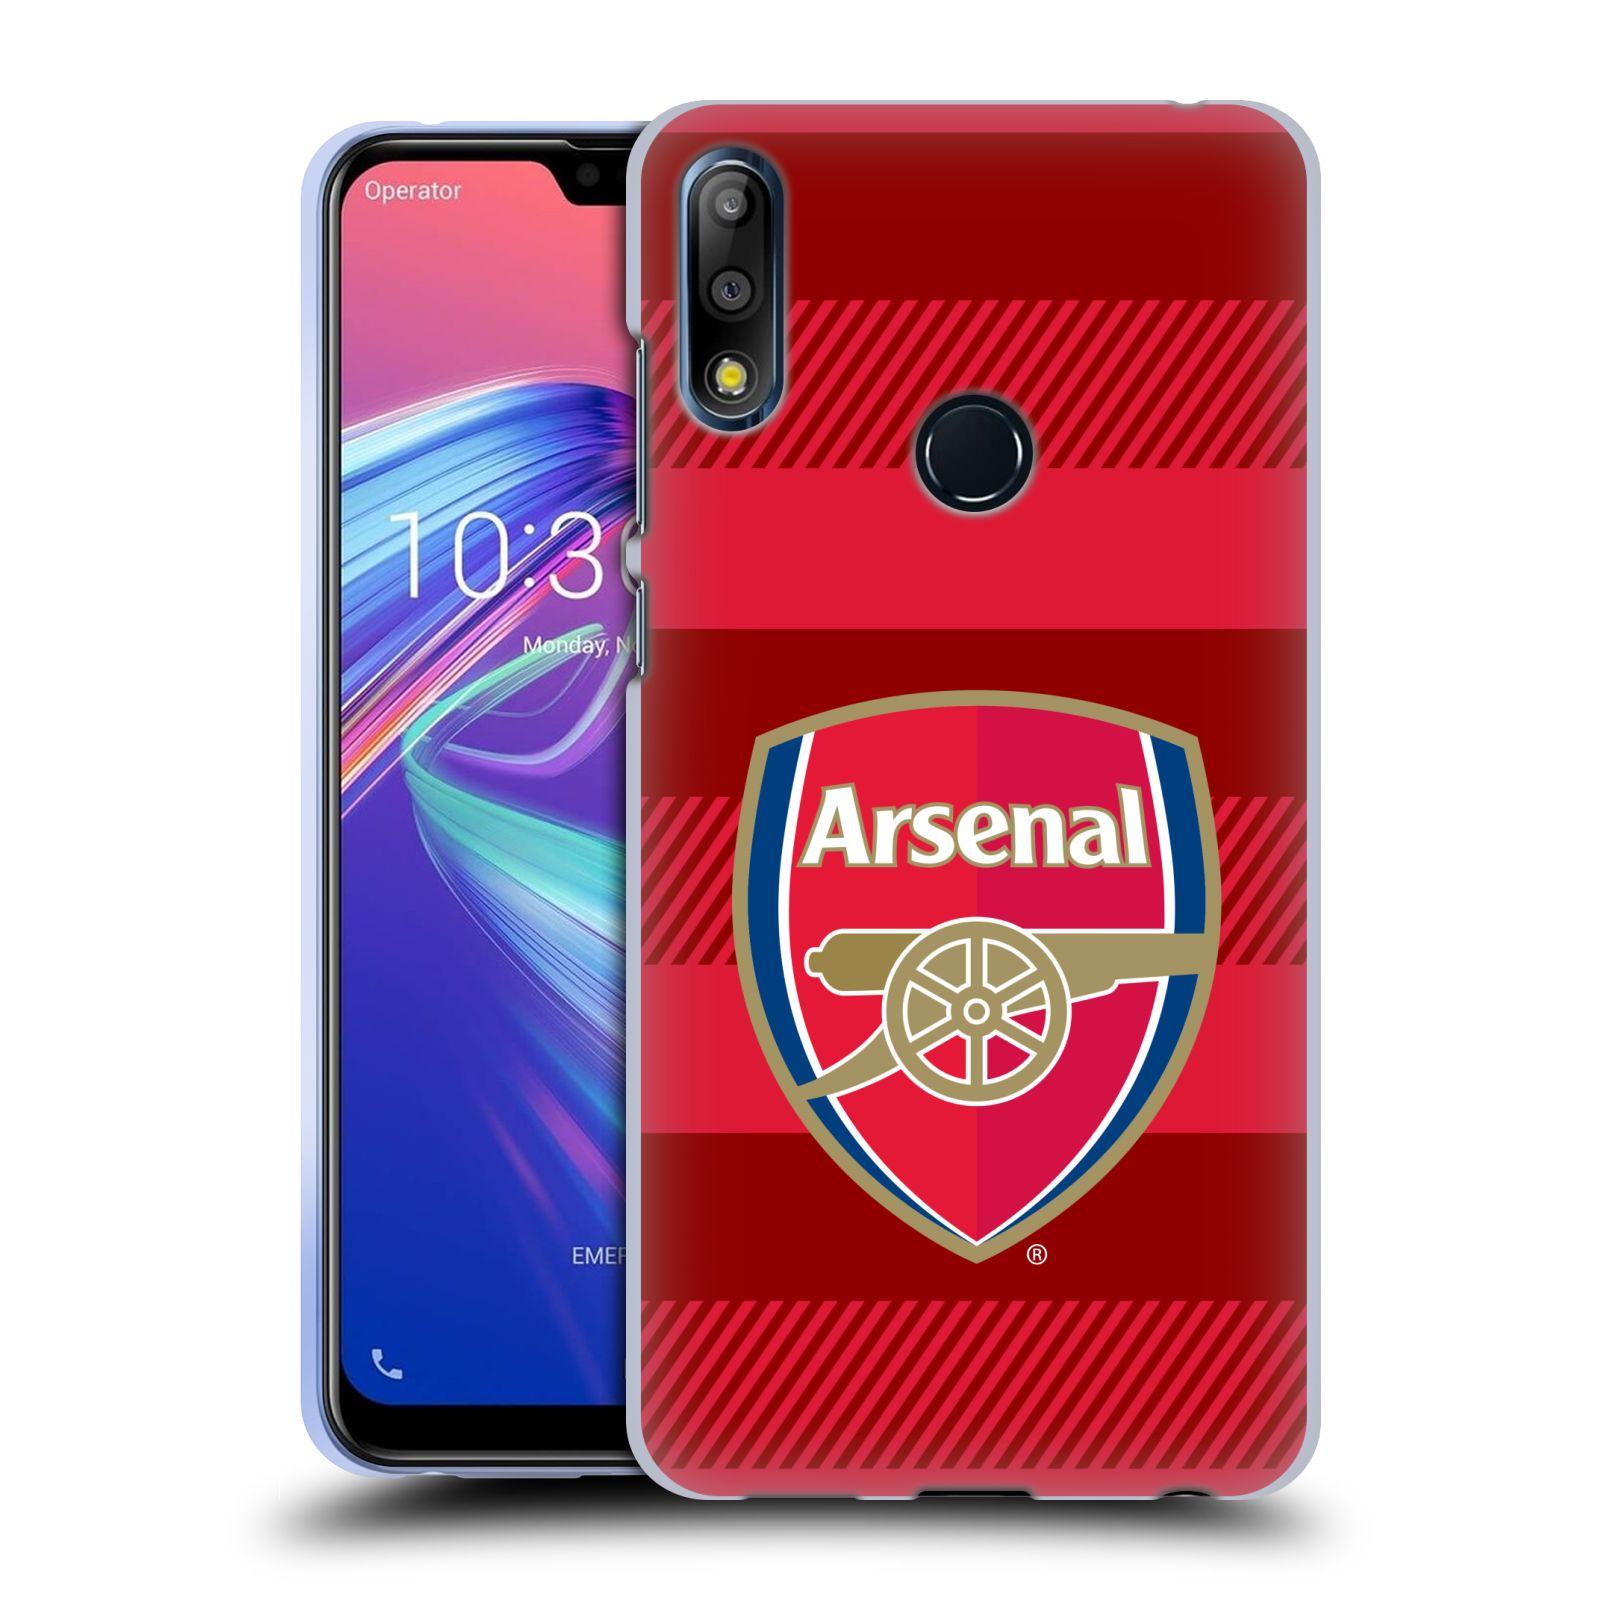 Silikonové pouzdro na mobil Asus Zenfone Max Pro M2 ZB631KL - Head Case - Arsenal FC - Logo s pruhy